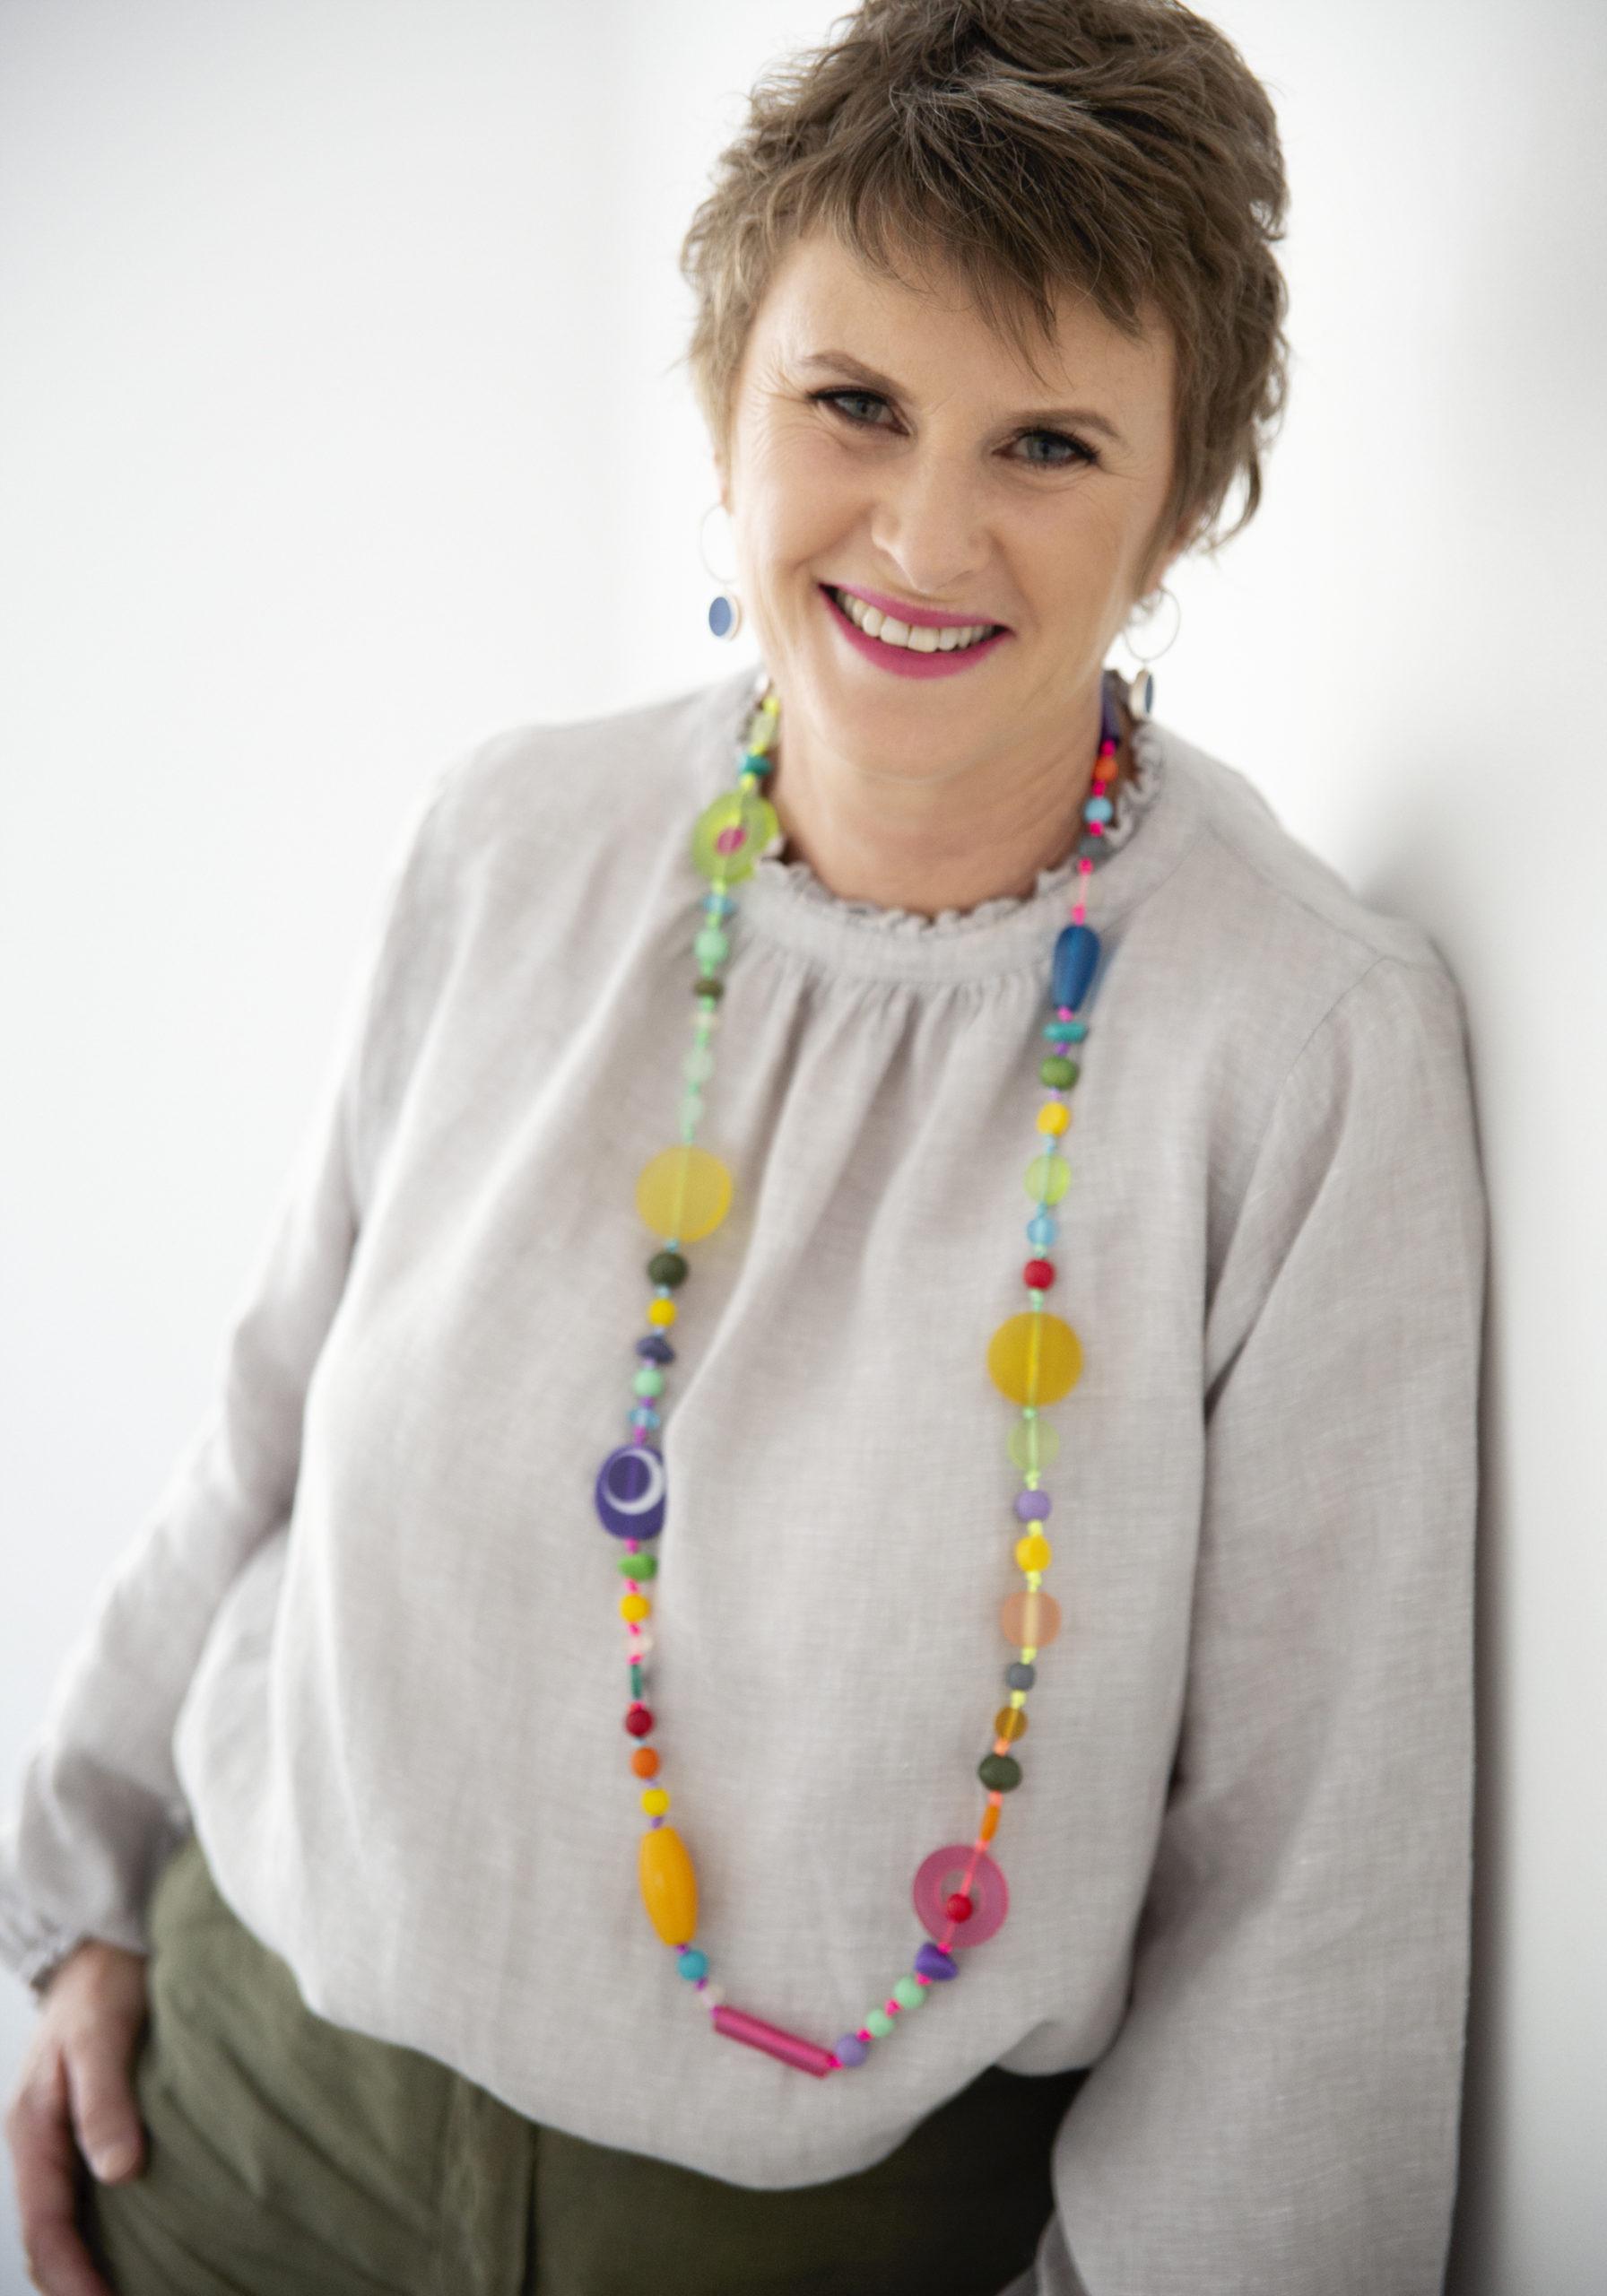 Fiona Boyle Nutritionist and Dietitian Tauranga